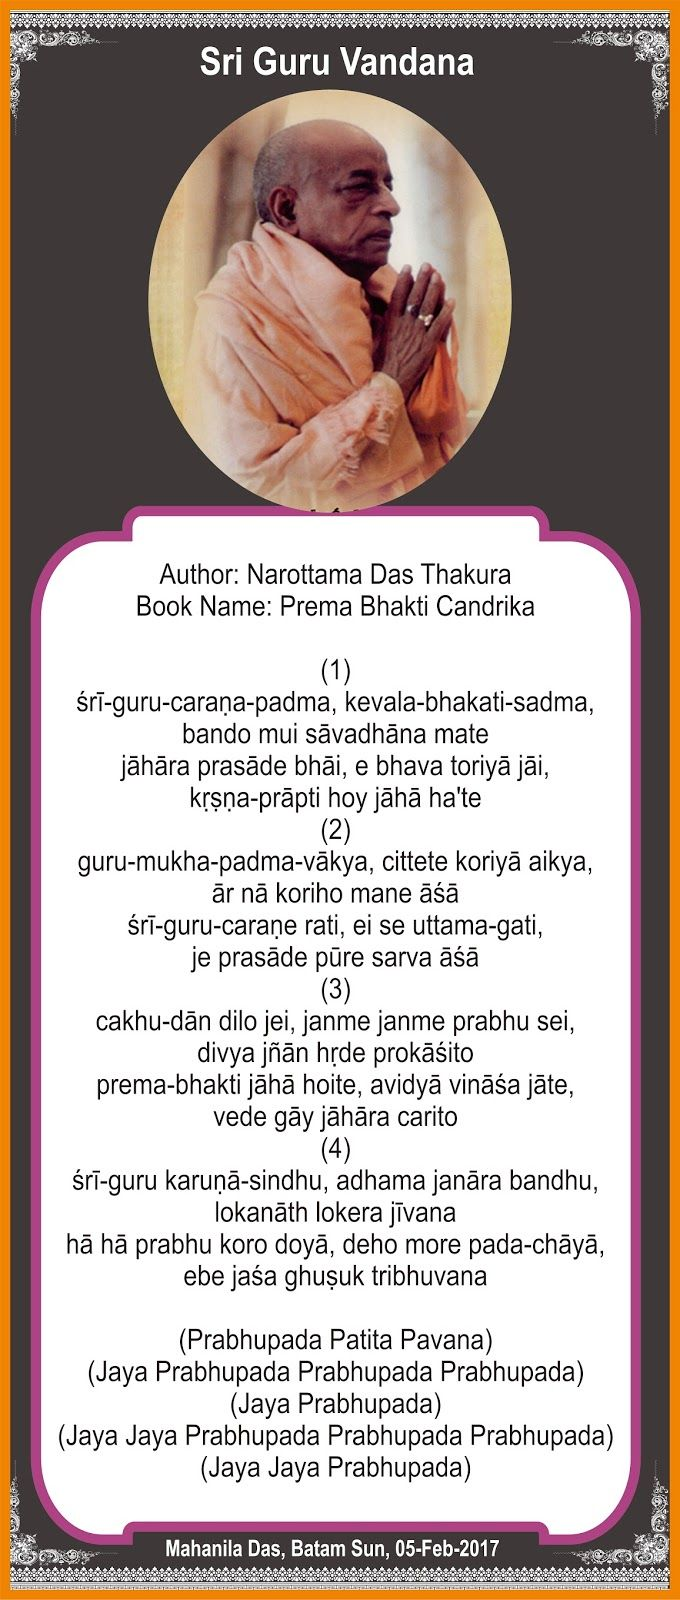 sanatana dharma sri guru vandana sri guru carana padma